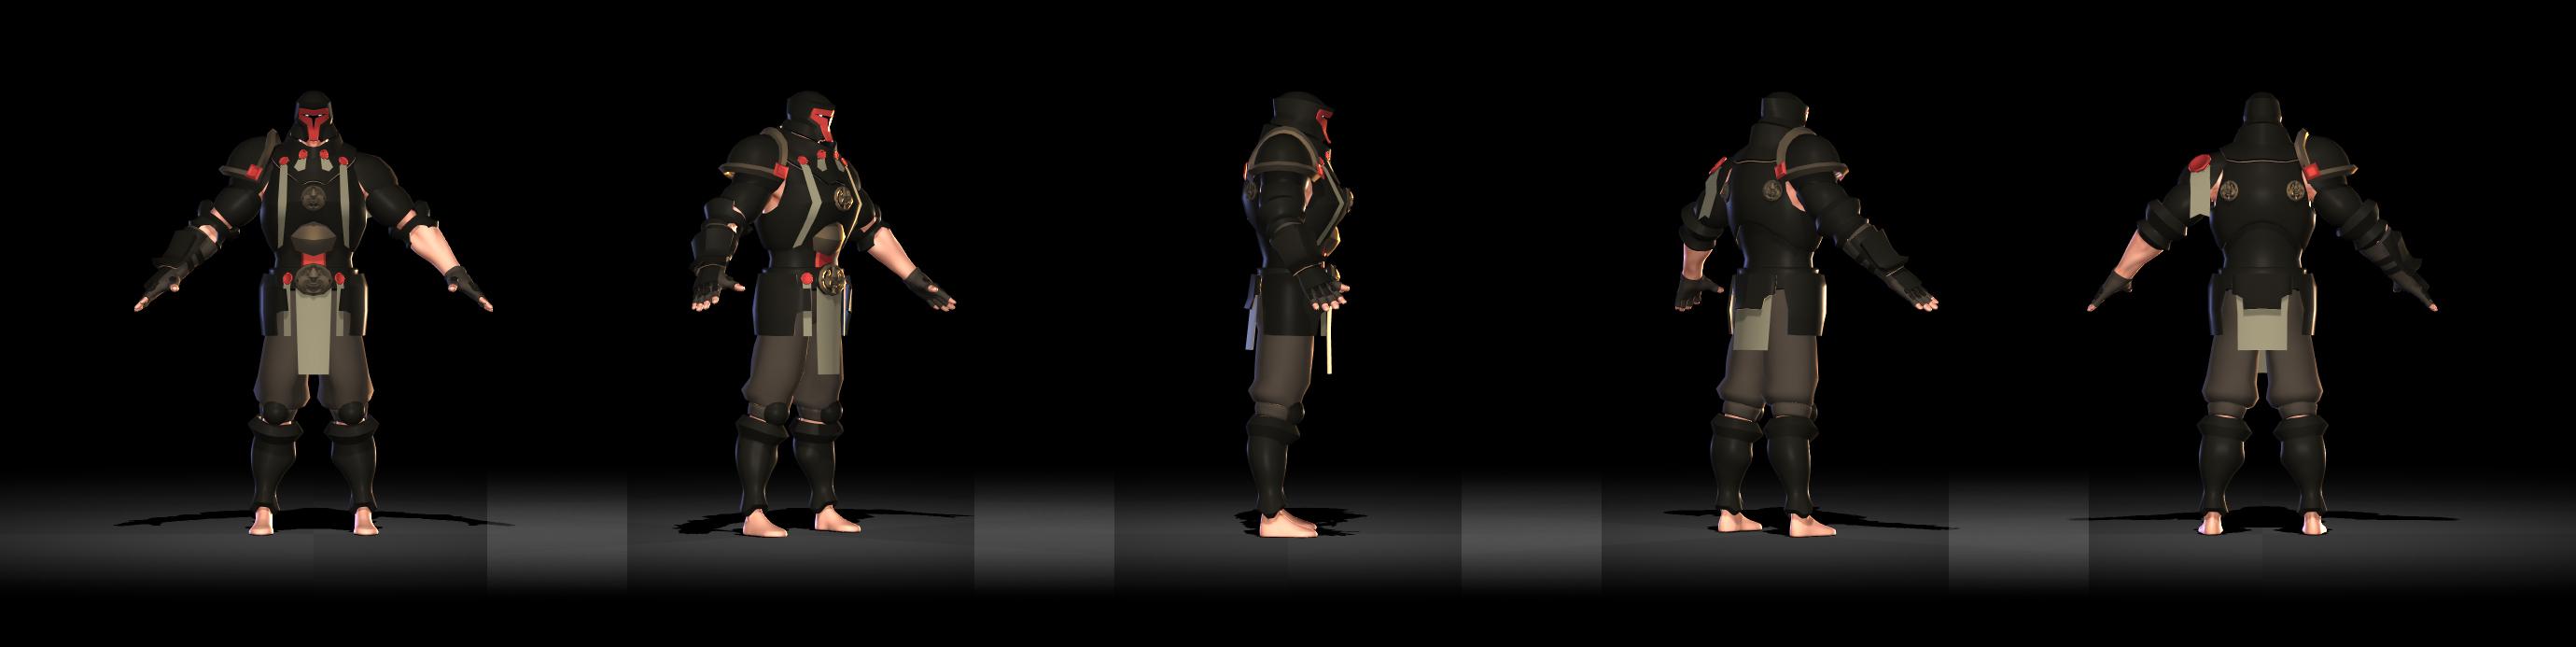 armor_blocking_by_legacygame-d82m62l.jpg